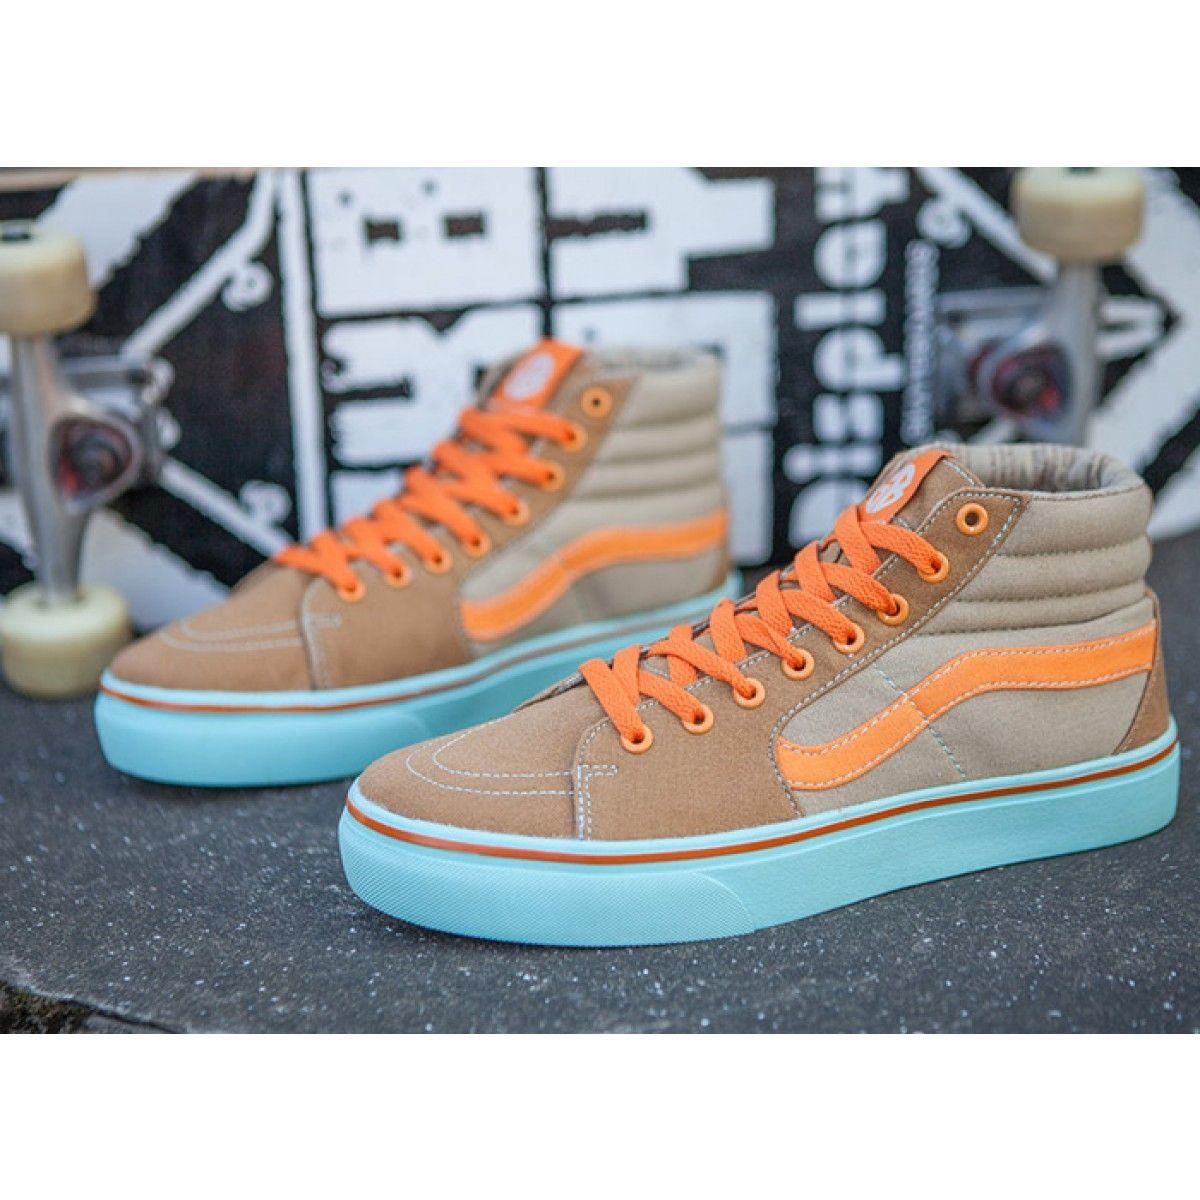 91345cab0f Vans SK8 Hi GB Tawny Orange Skate Shoes  Vans